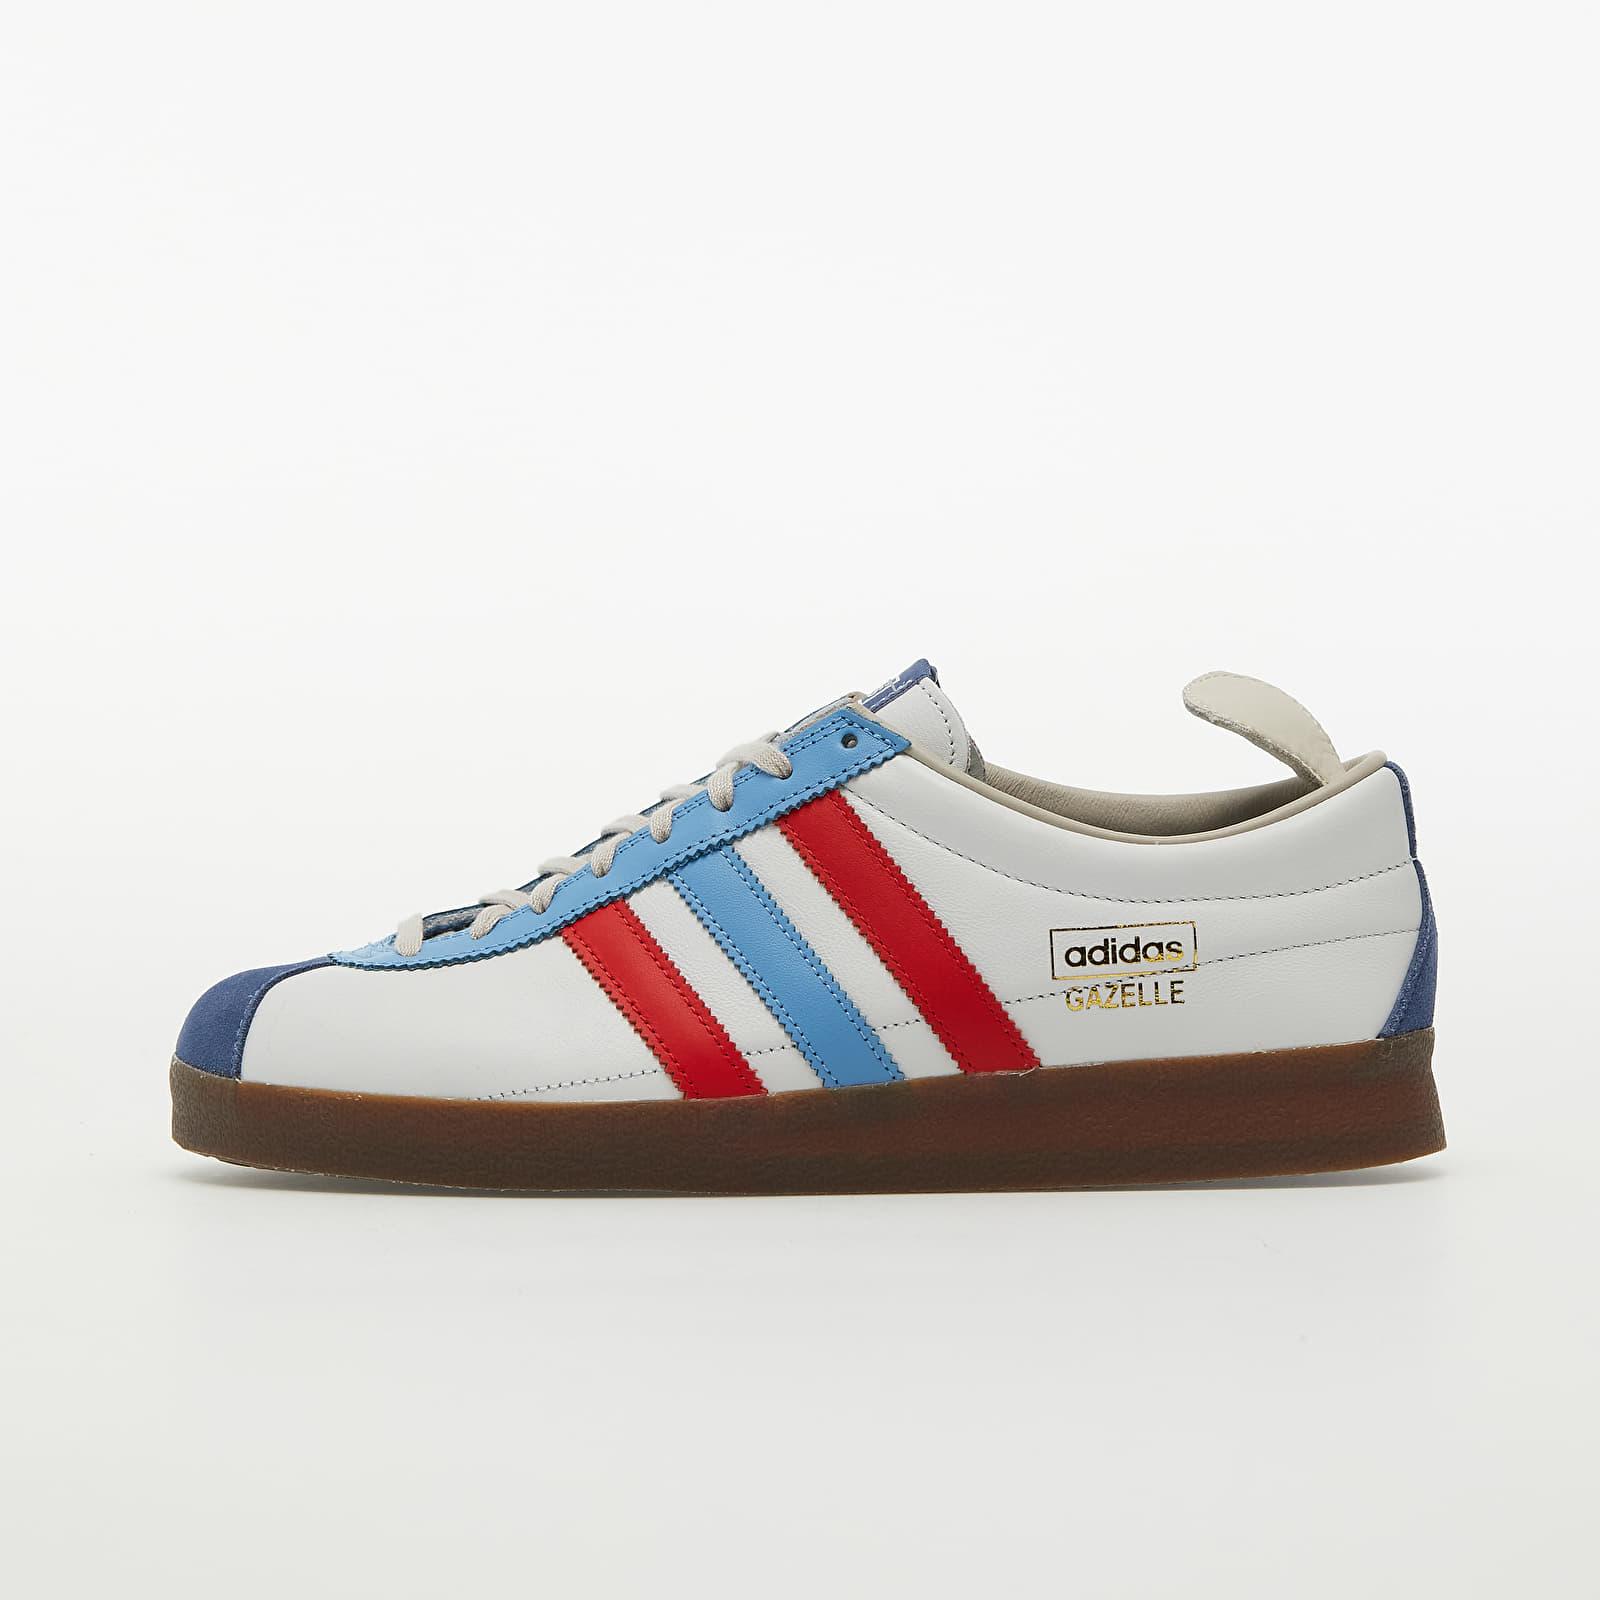 adidas Gazelle Vintage Crystal White/ Vivid Red/ Light Blue | Footshop